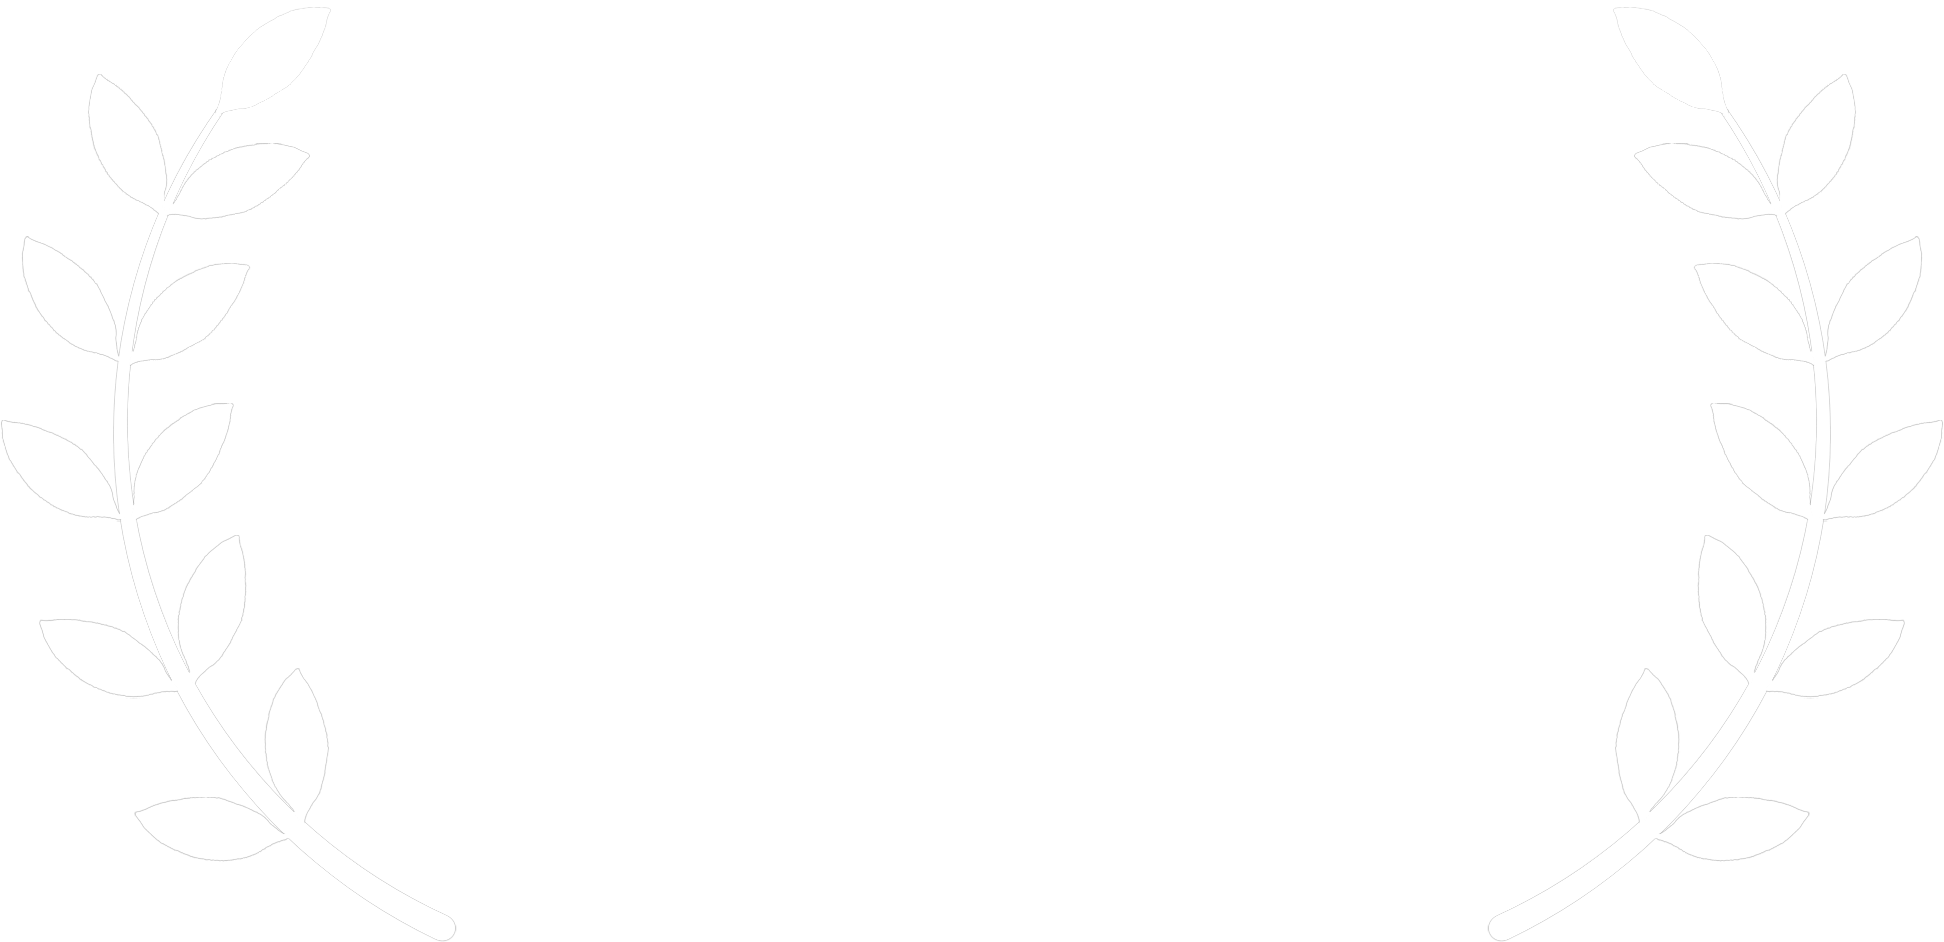 jules verne jury award